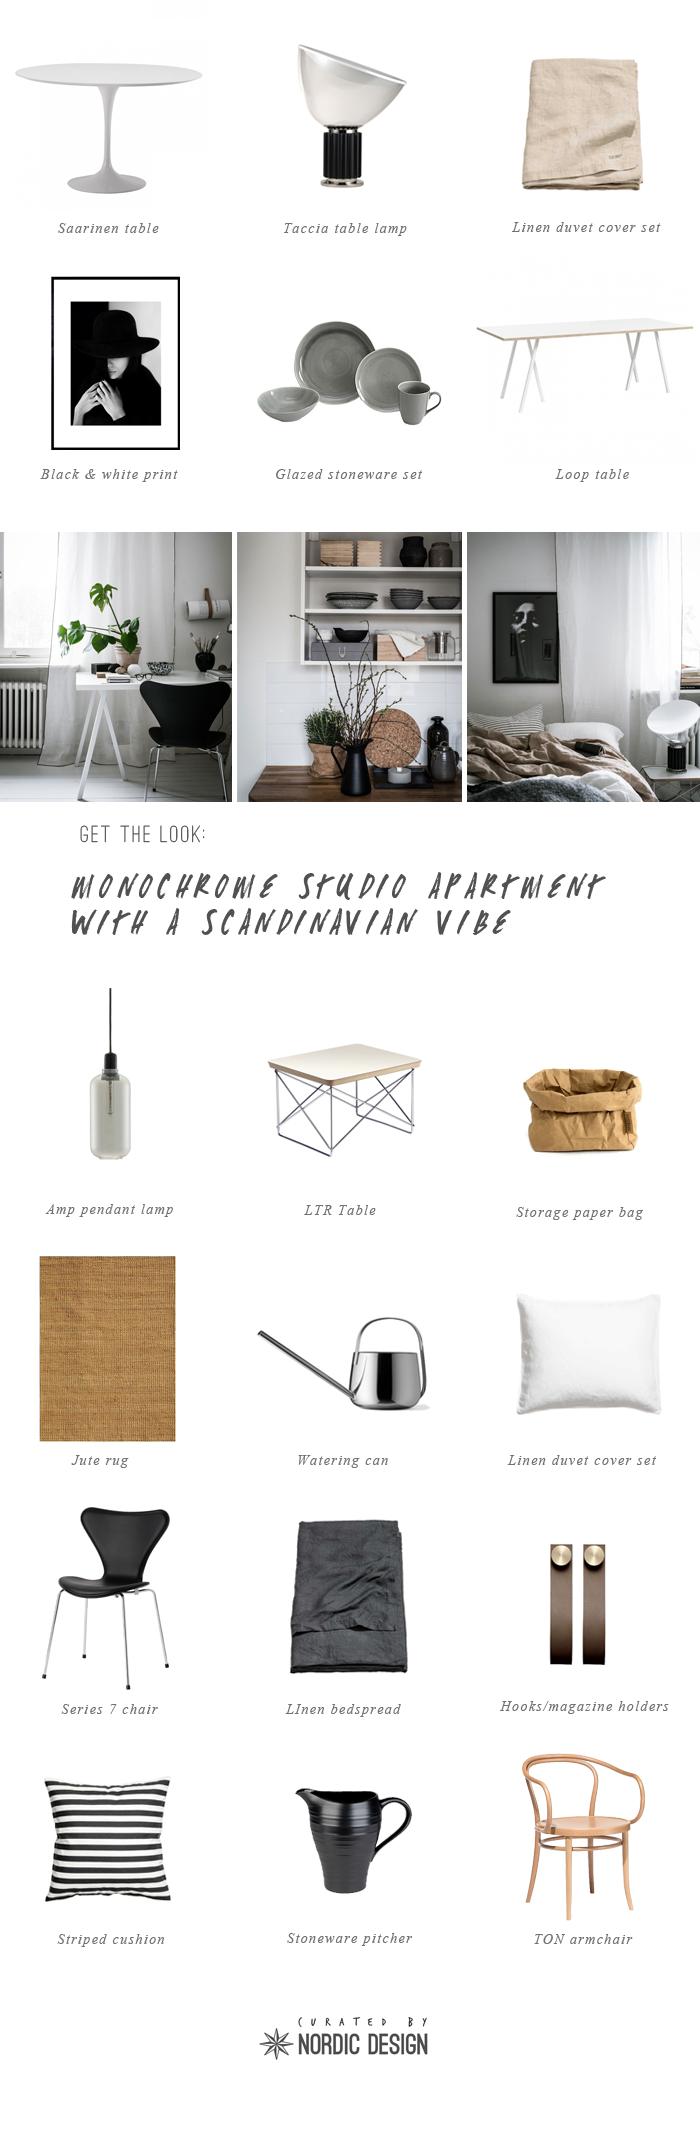 Monochrome-studio-apartment-get-the-look